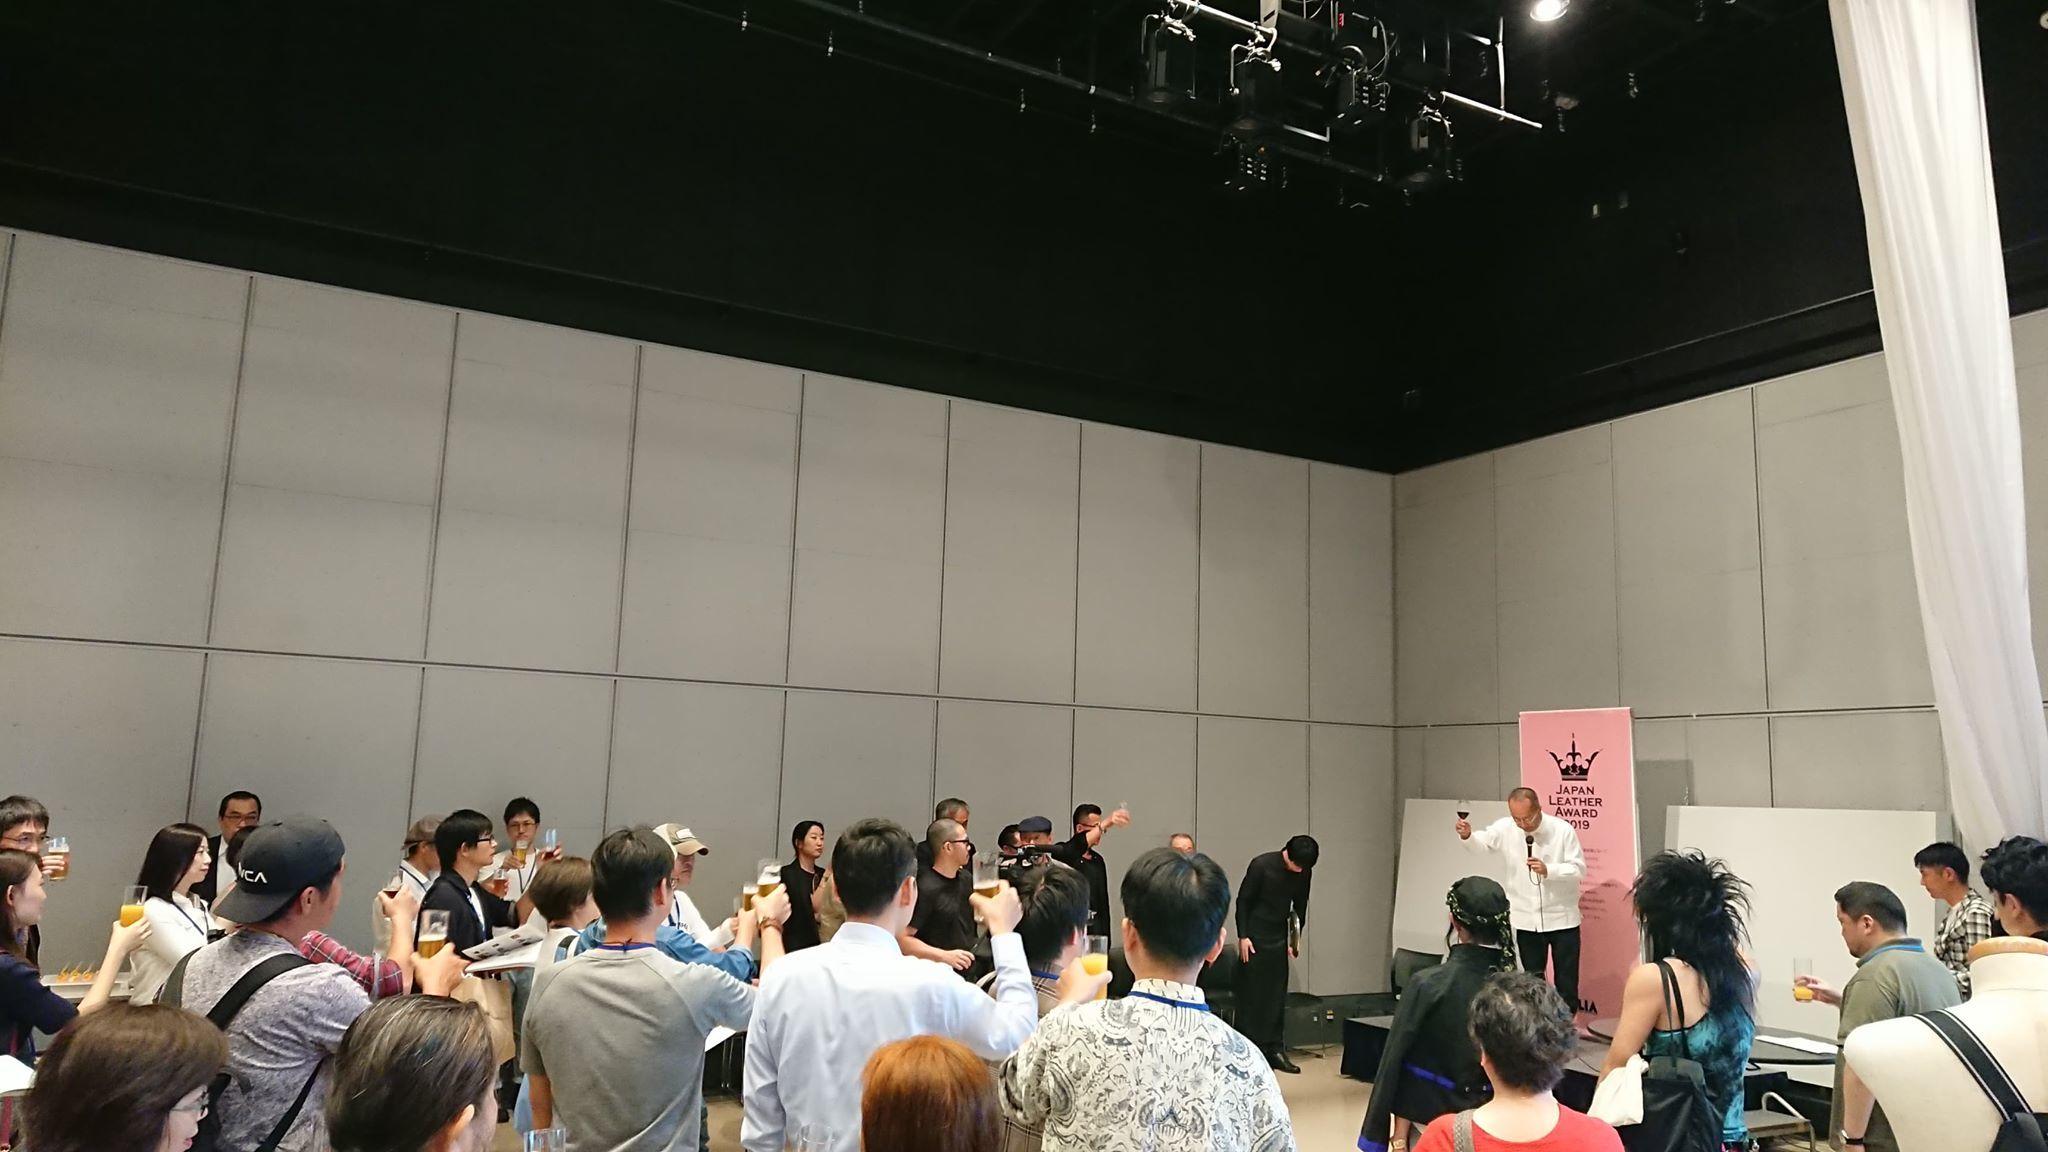 【Japan Leather Award 2019】一般公開&懇親会無事に終了いたしました。_f0340942_15303821.jpg